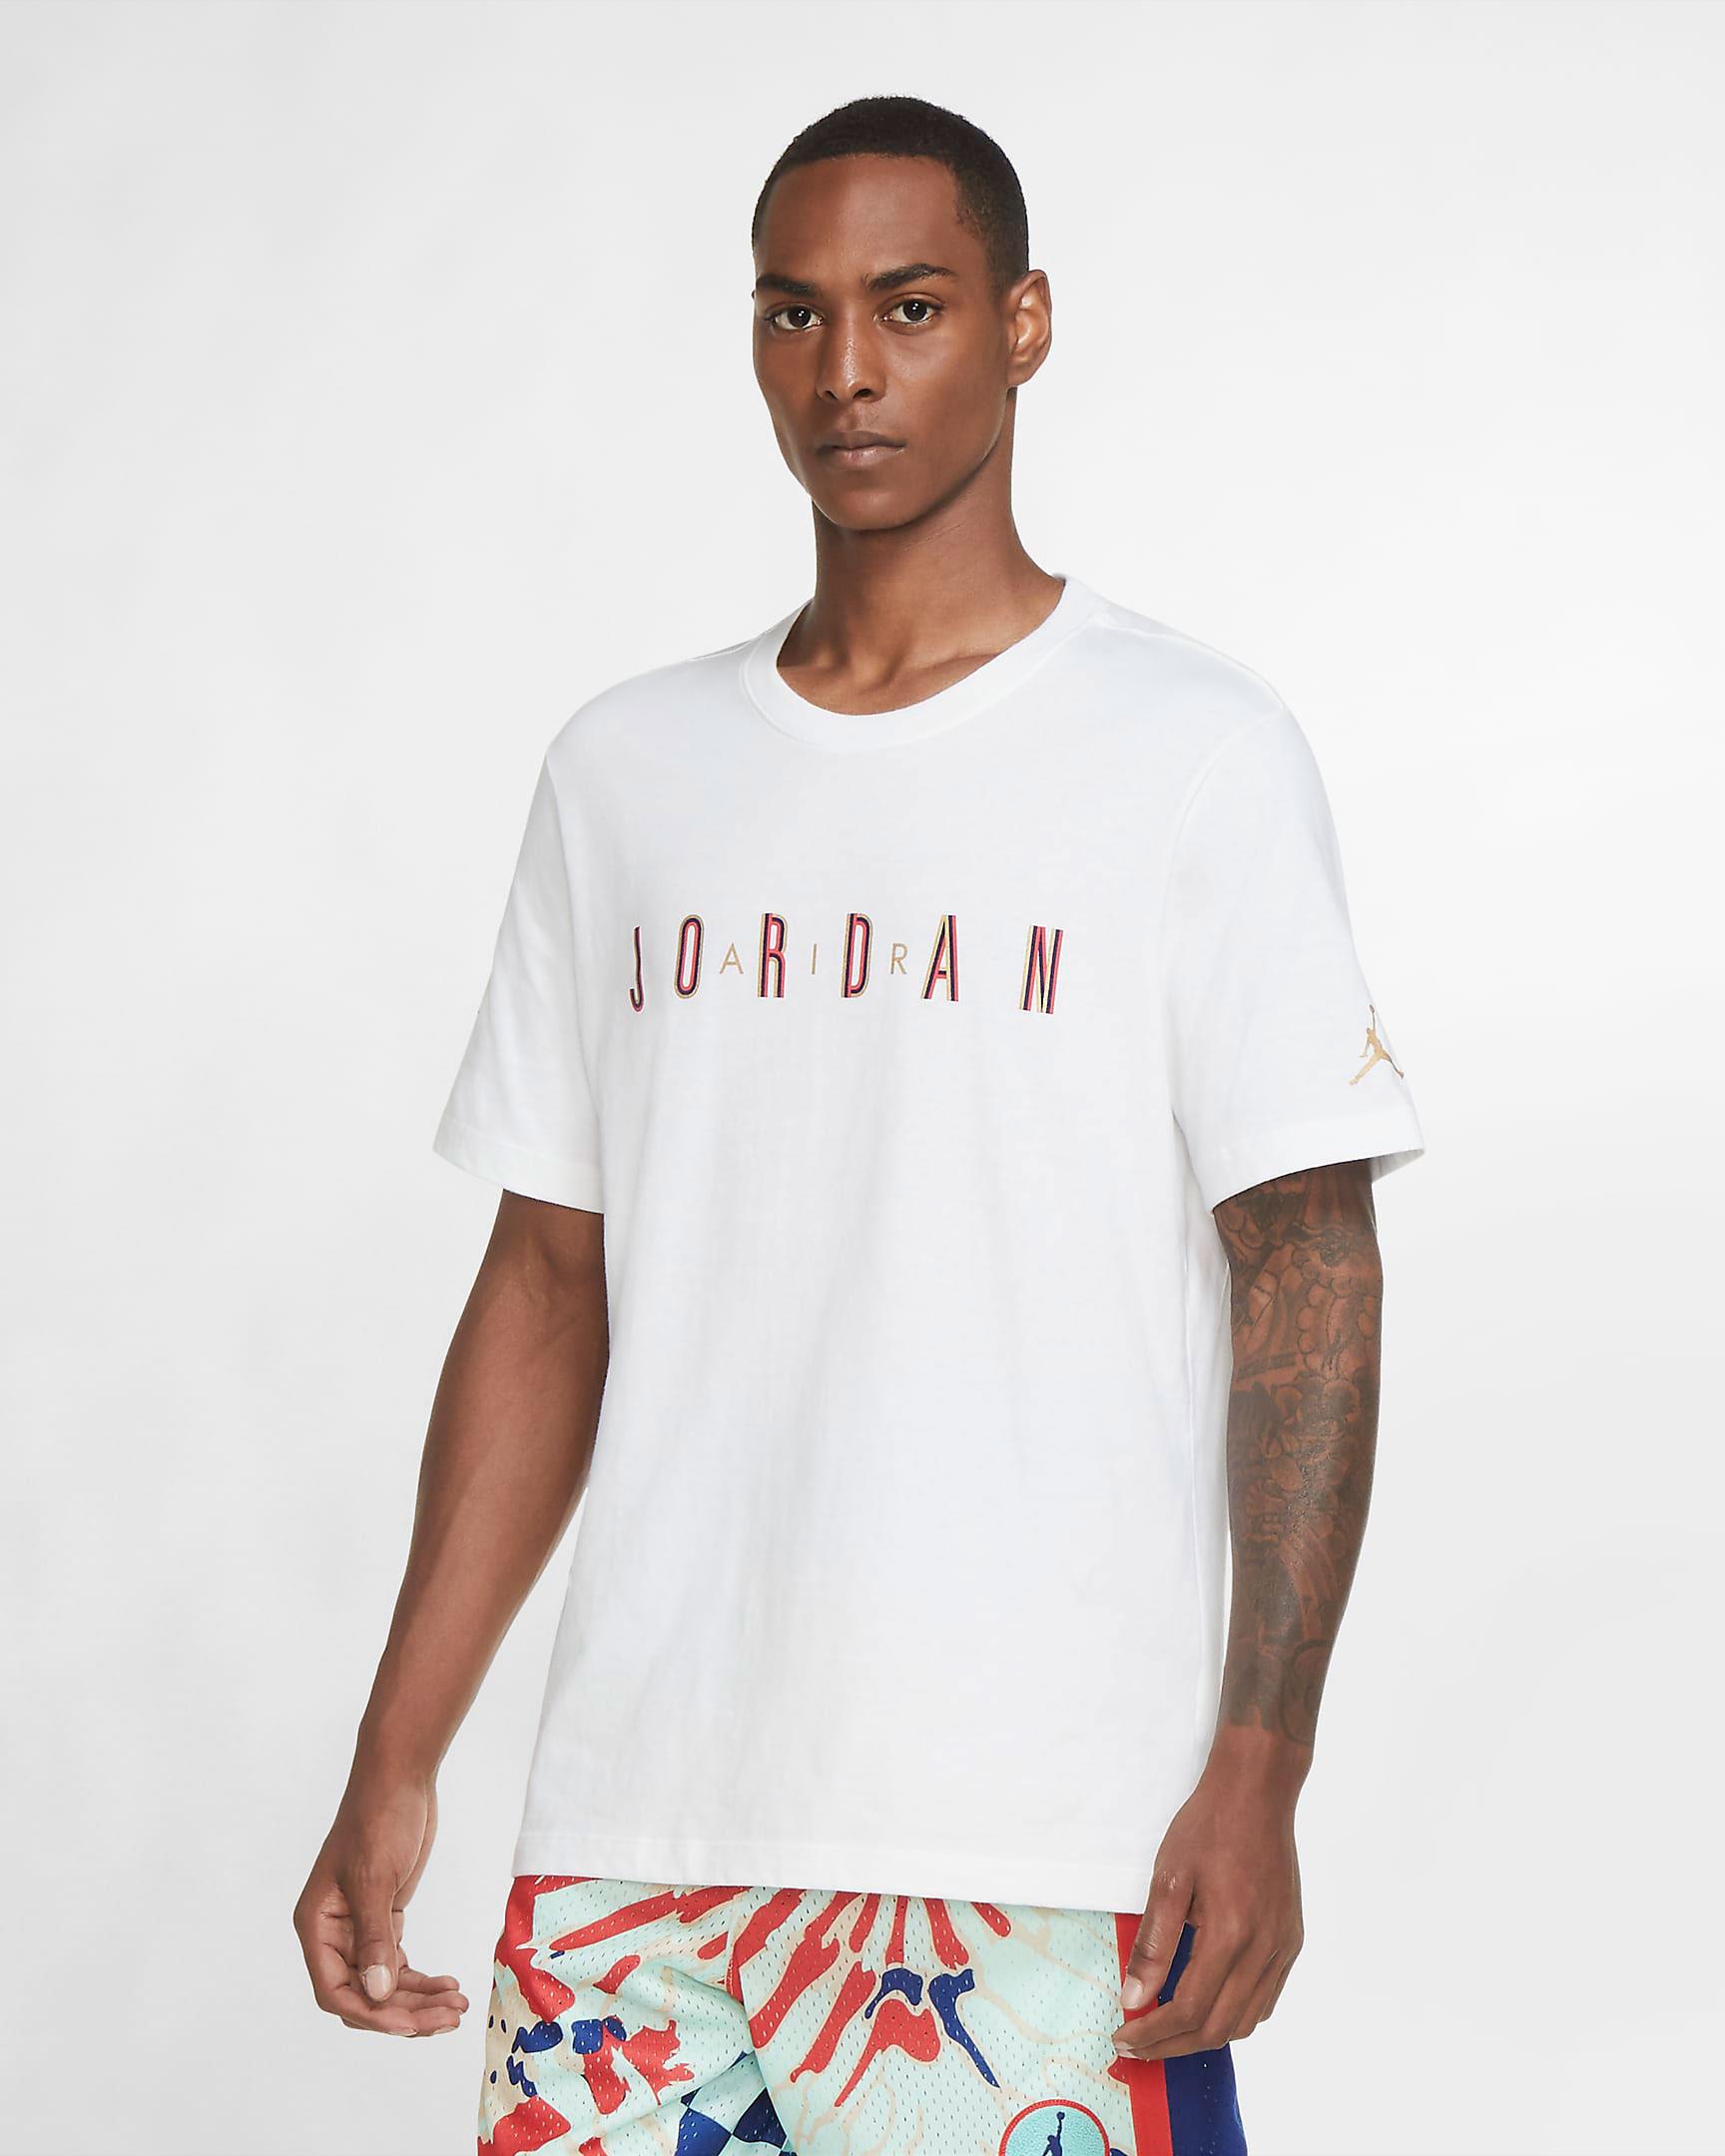 air-jordan-7-china-cile-red-shirt-match-2